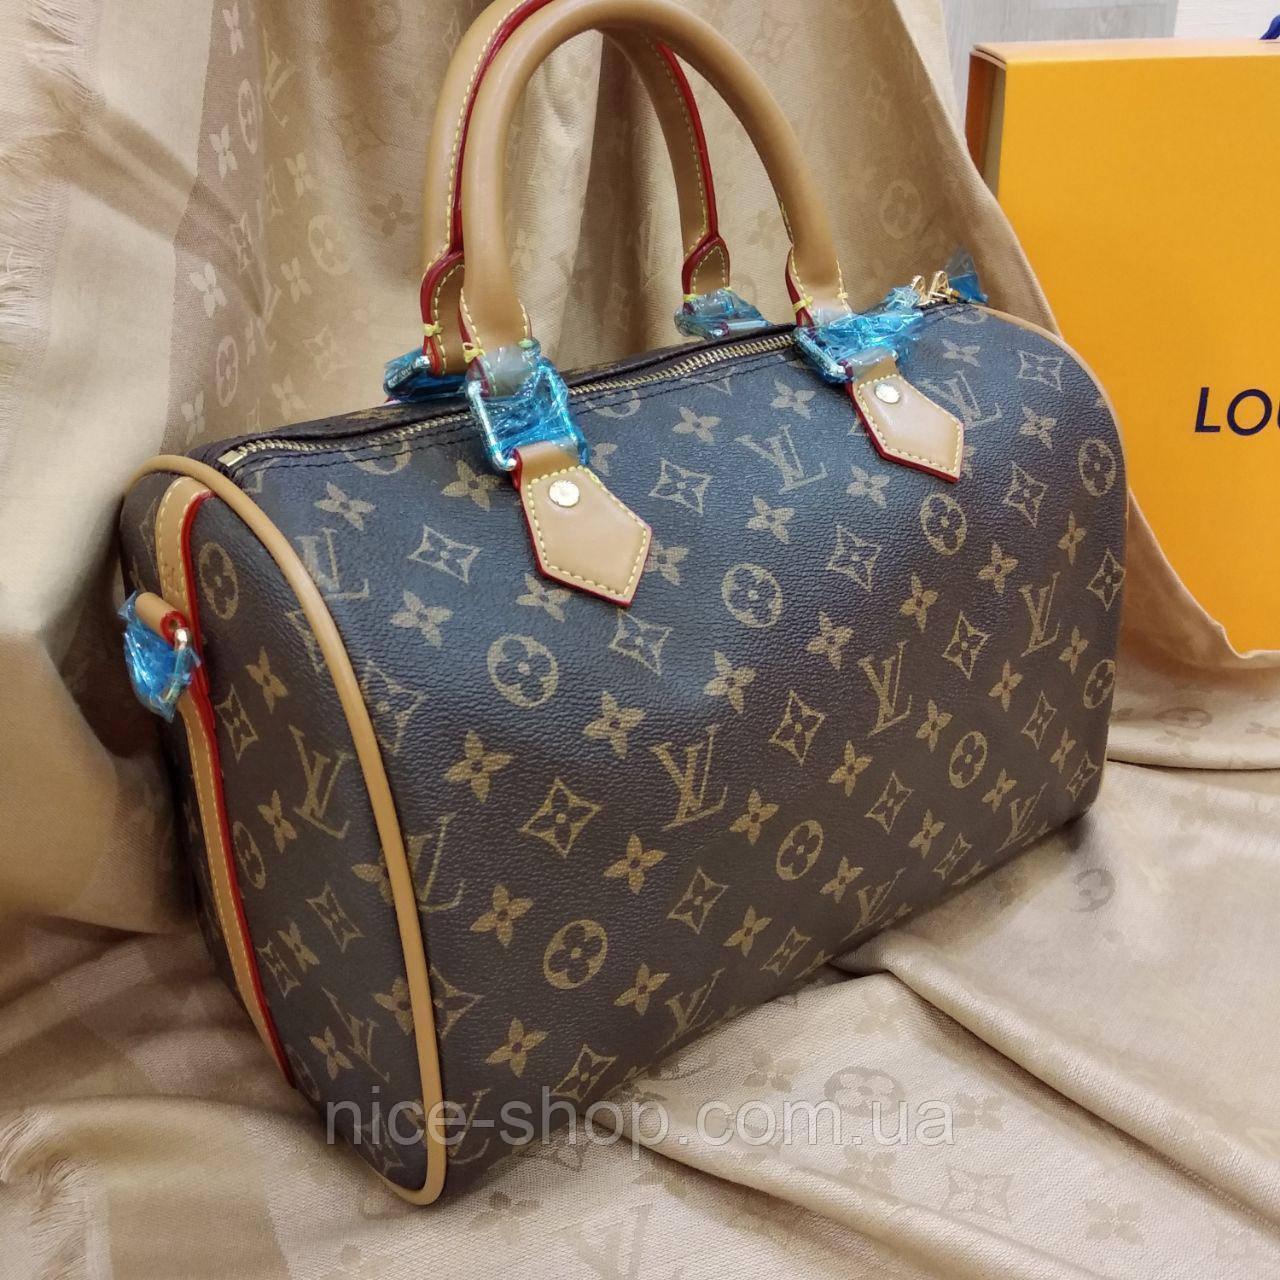 Сумка Louis Vuitton Speedy 30 см, монограмм, фото 1